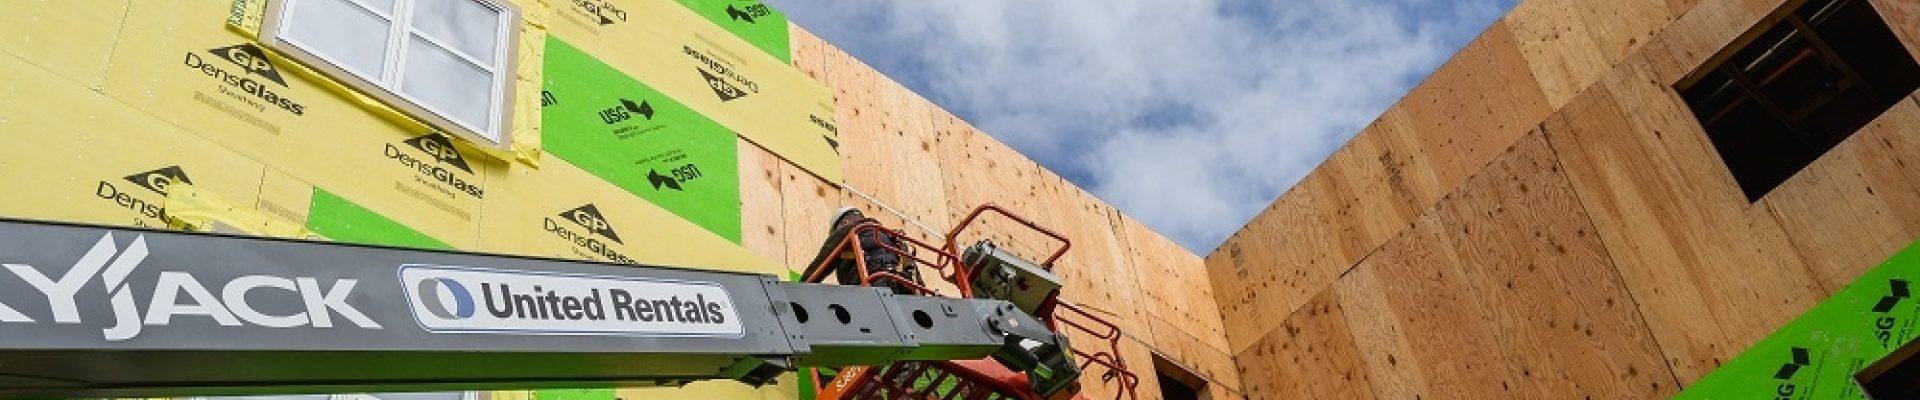 Danco Builders Build Up Community